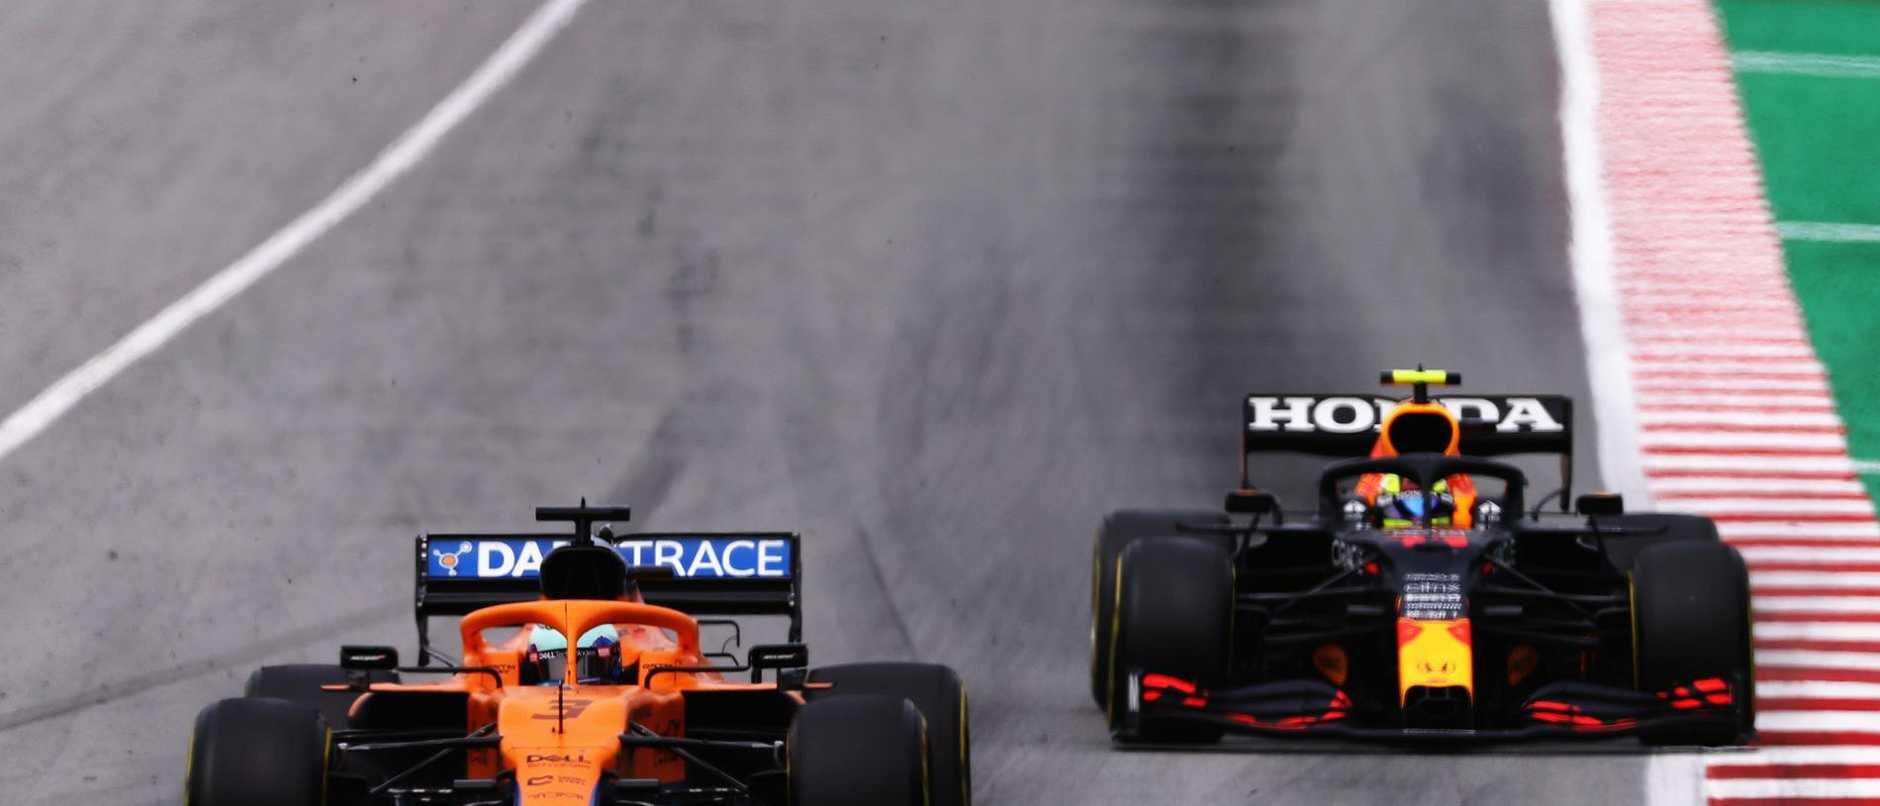 Move over, Lando! Daniel Ricciardo rips control from McLaren teammate